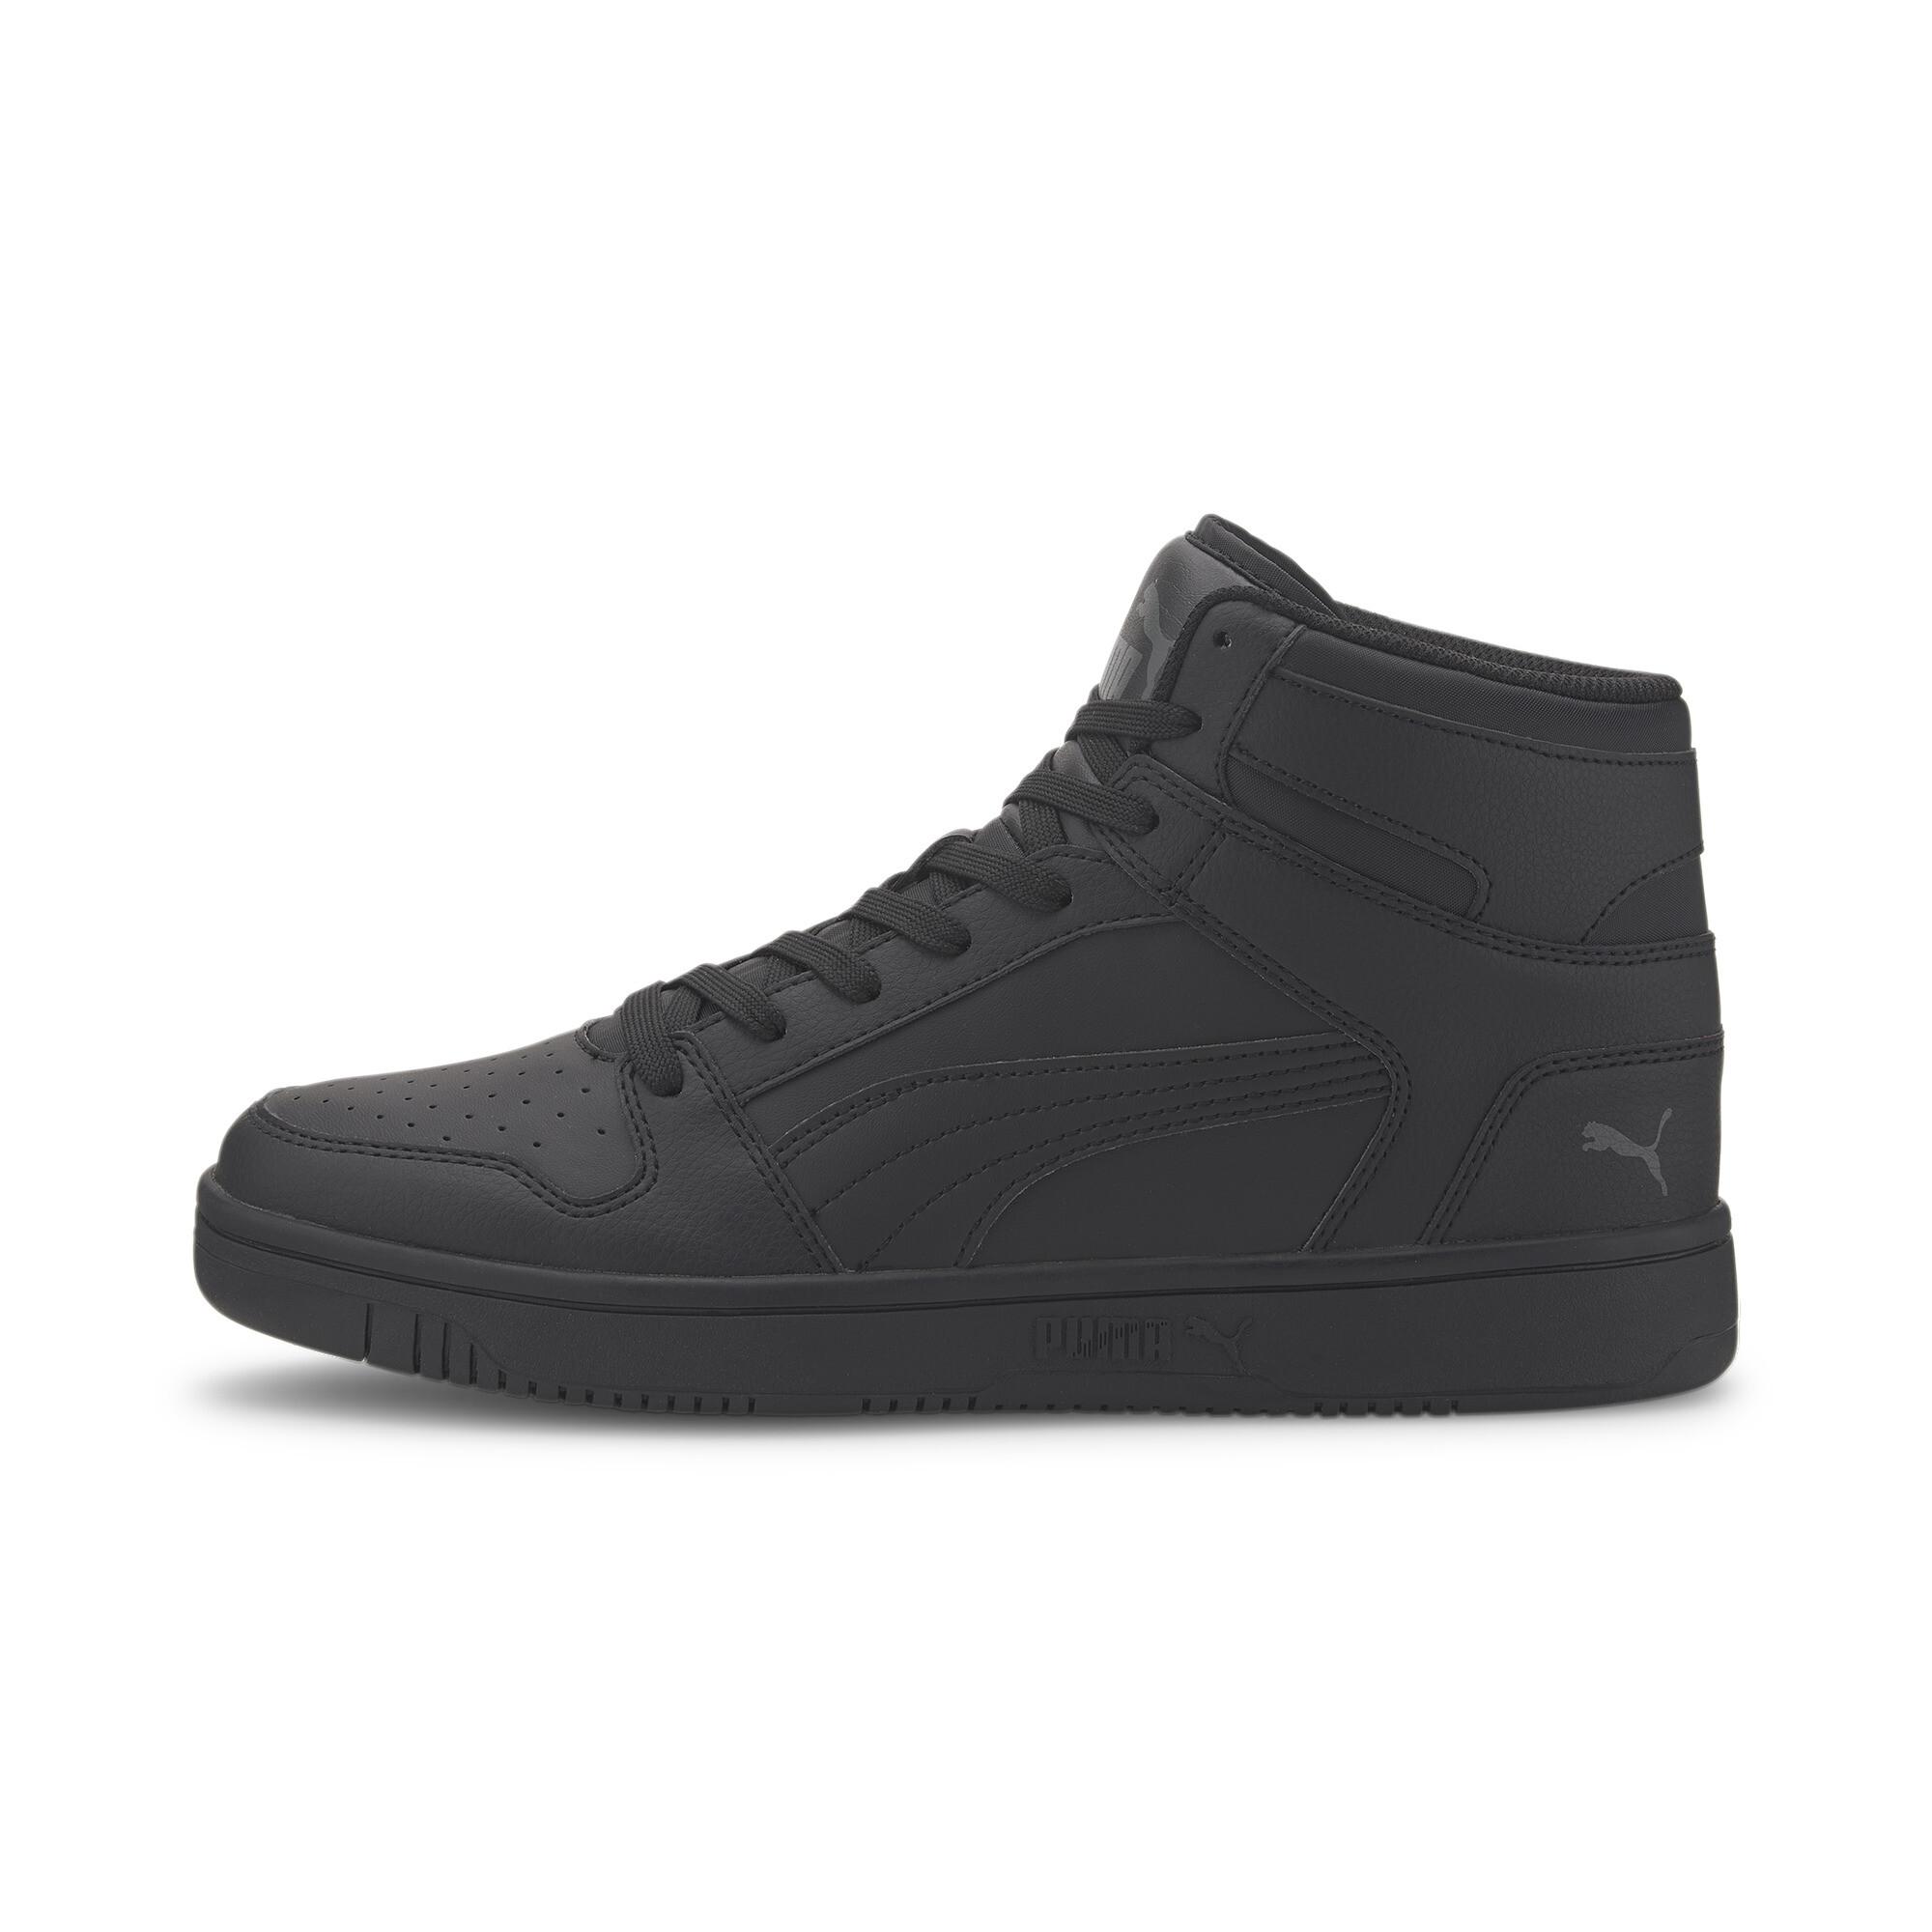 miniature 6 - Puma Men's Rebound LayUp Sneakers